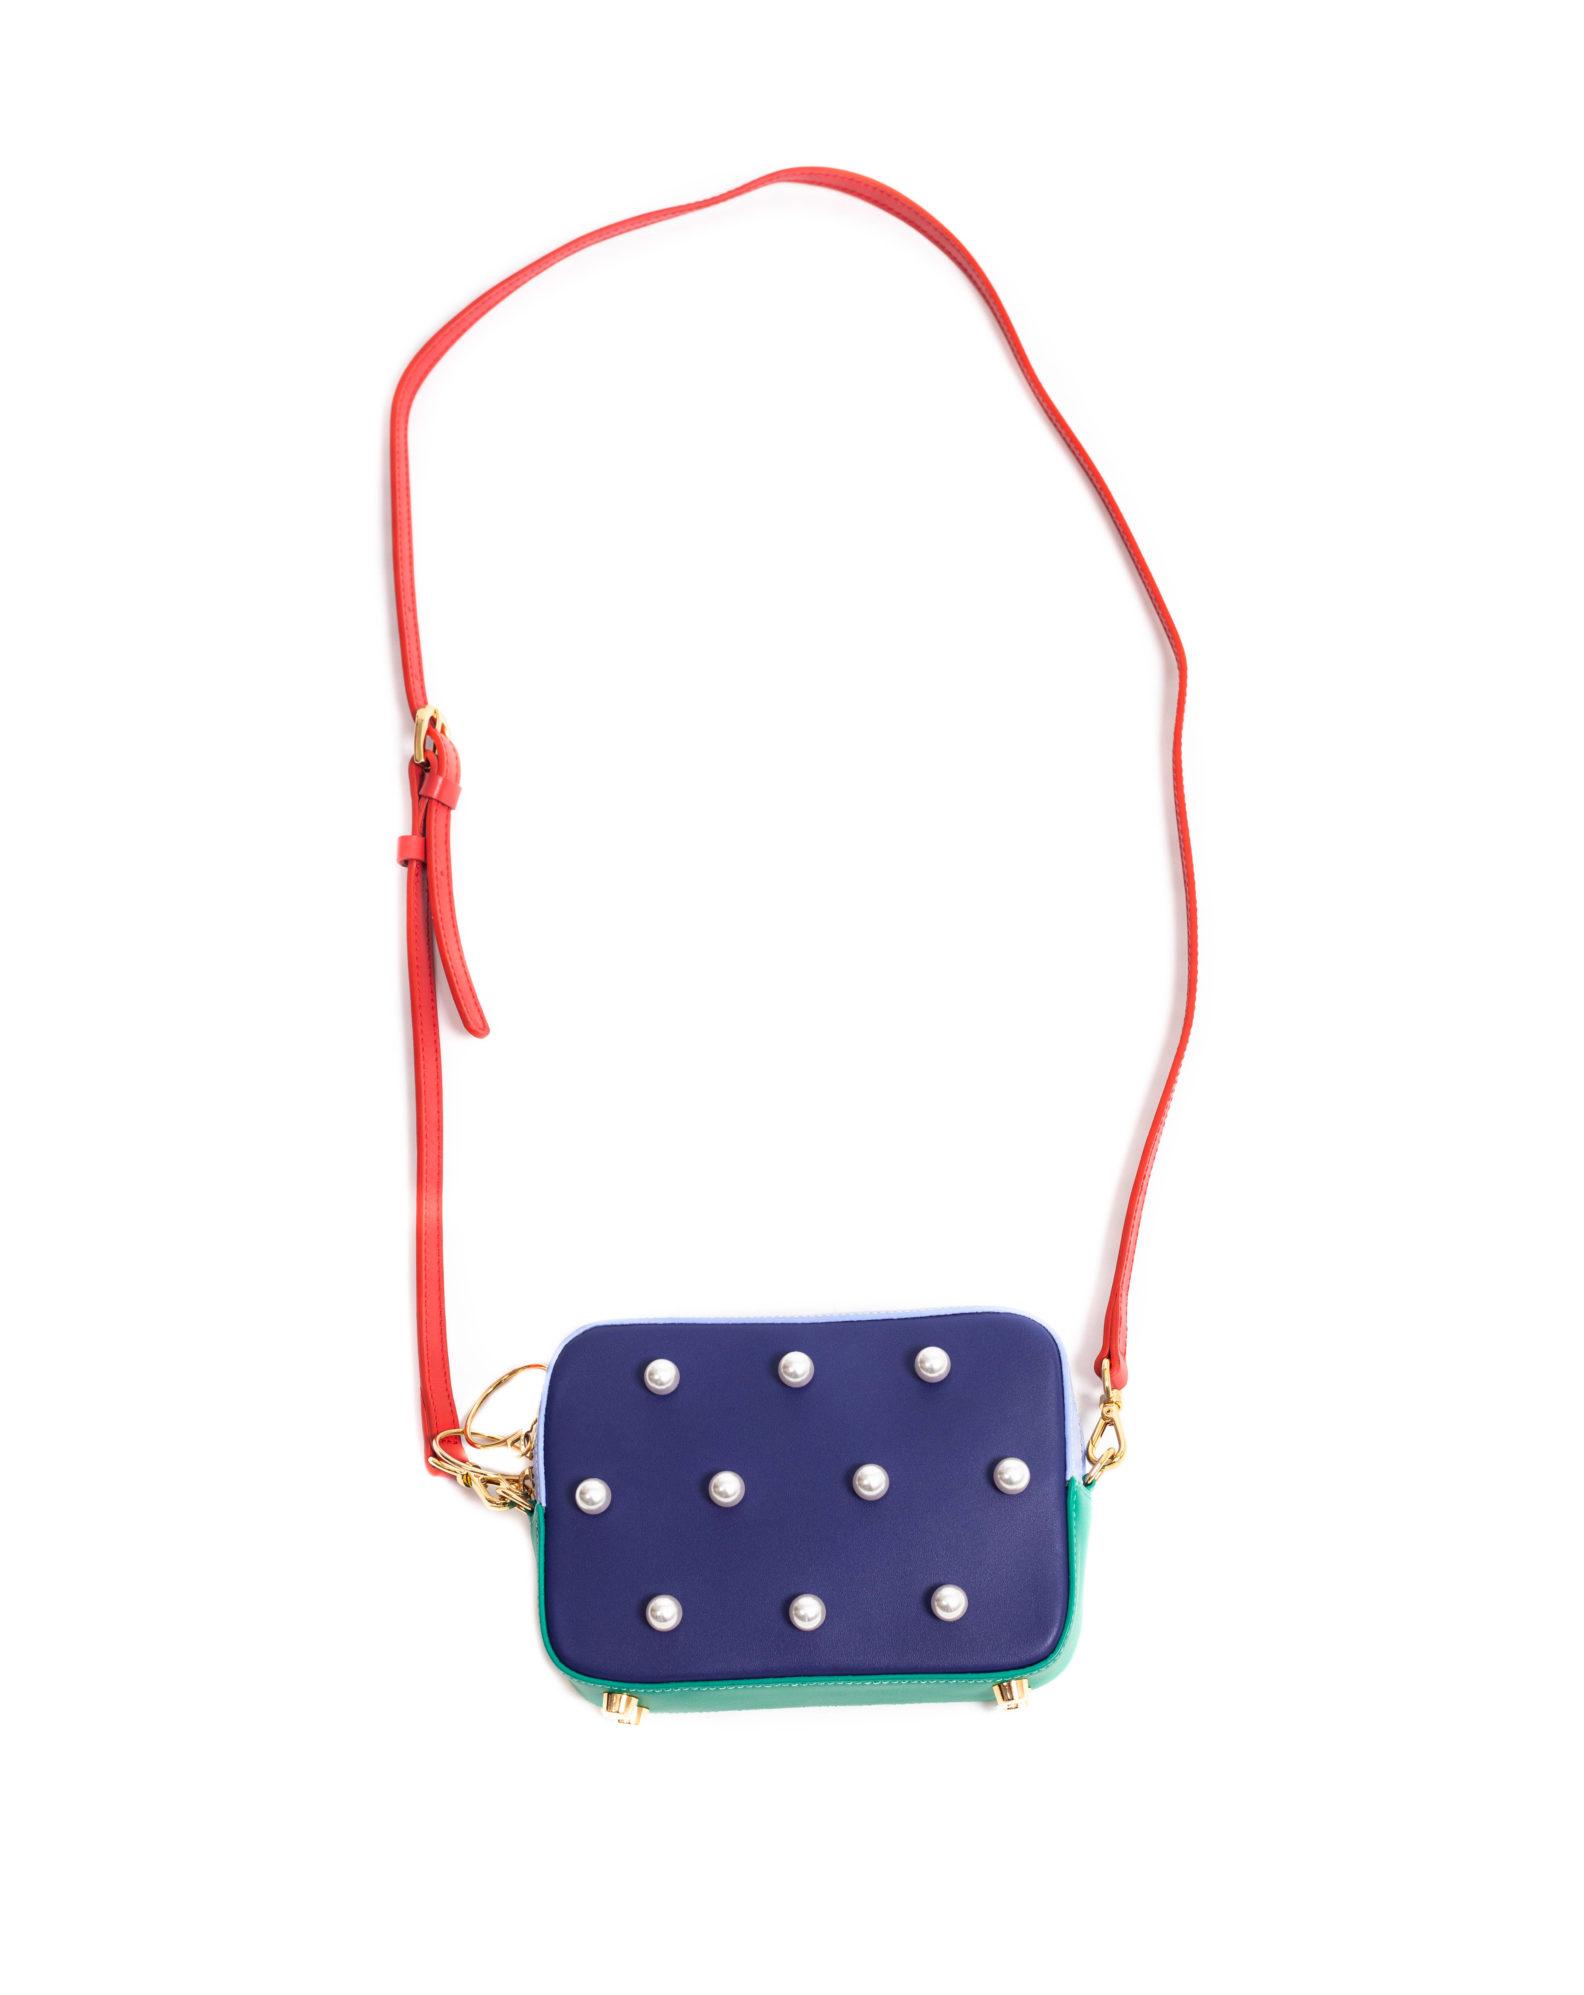 petit-sac-cuir-rectangulaire-collector-eenk-slow-fashion-leather-bag-affaires-etrangeres-bijou